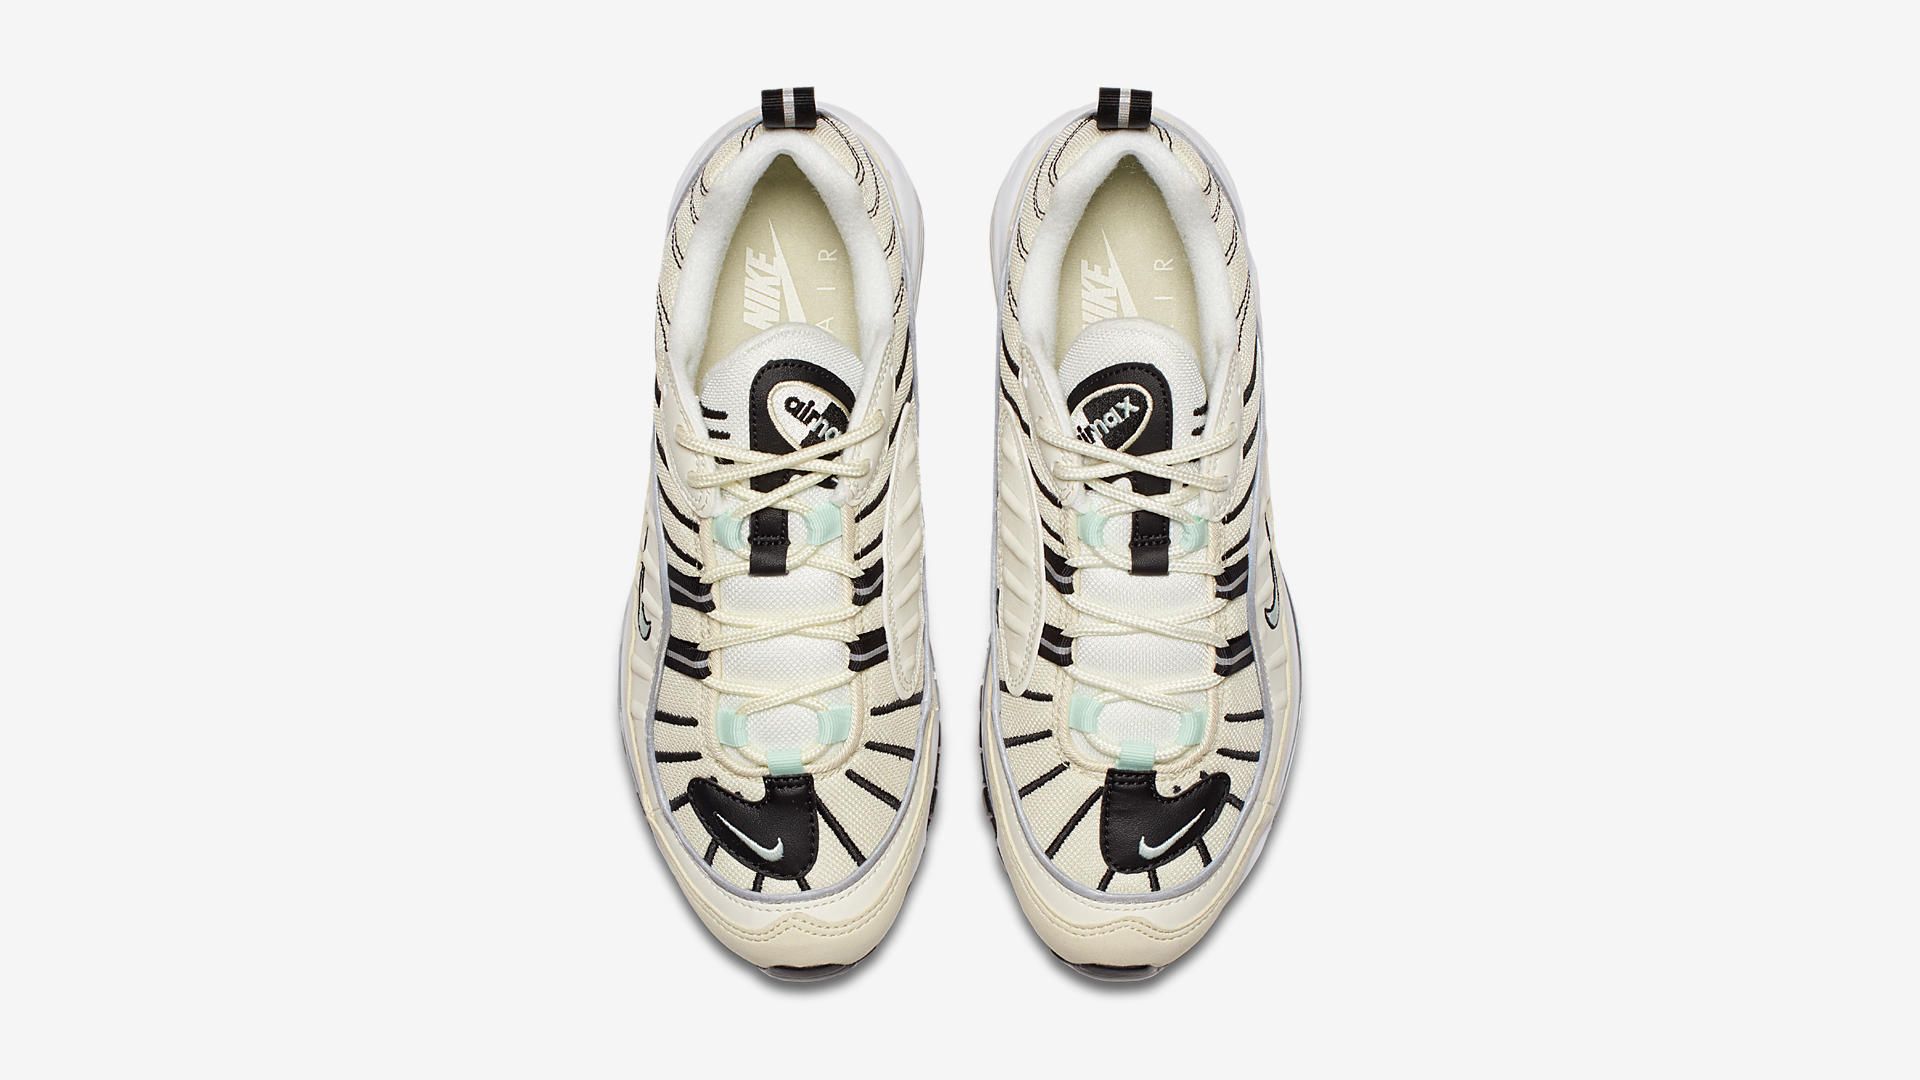 Nike Air Max 98 Sail / Igloo / Fossil / Reflect Silver (AH6799-105)